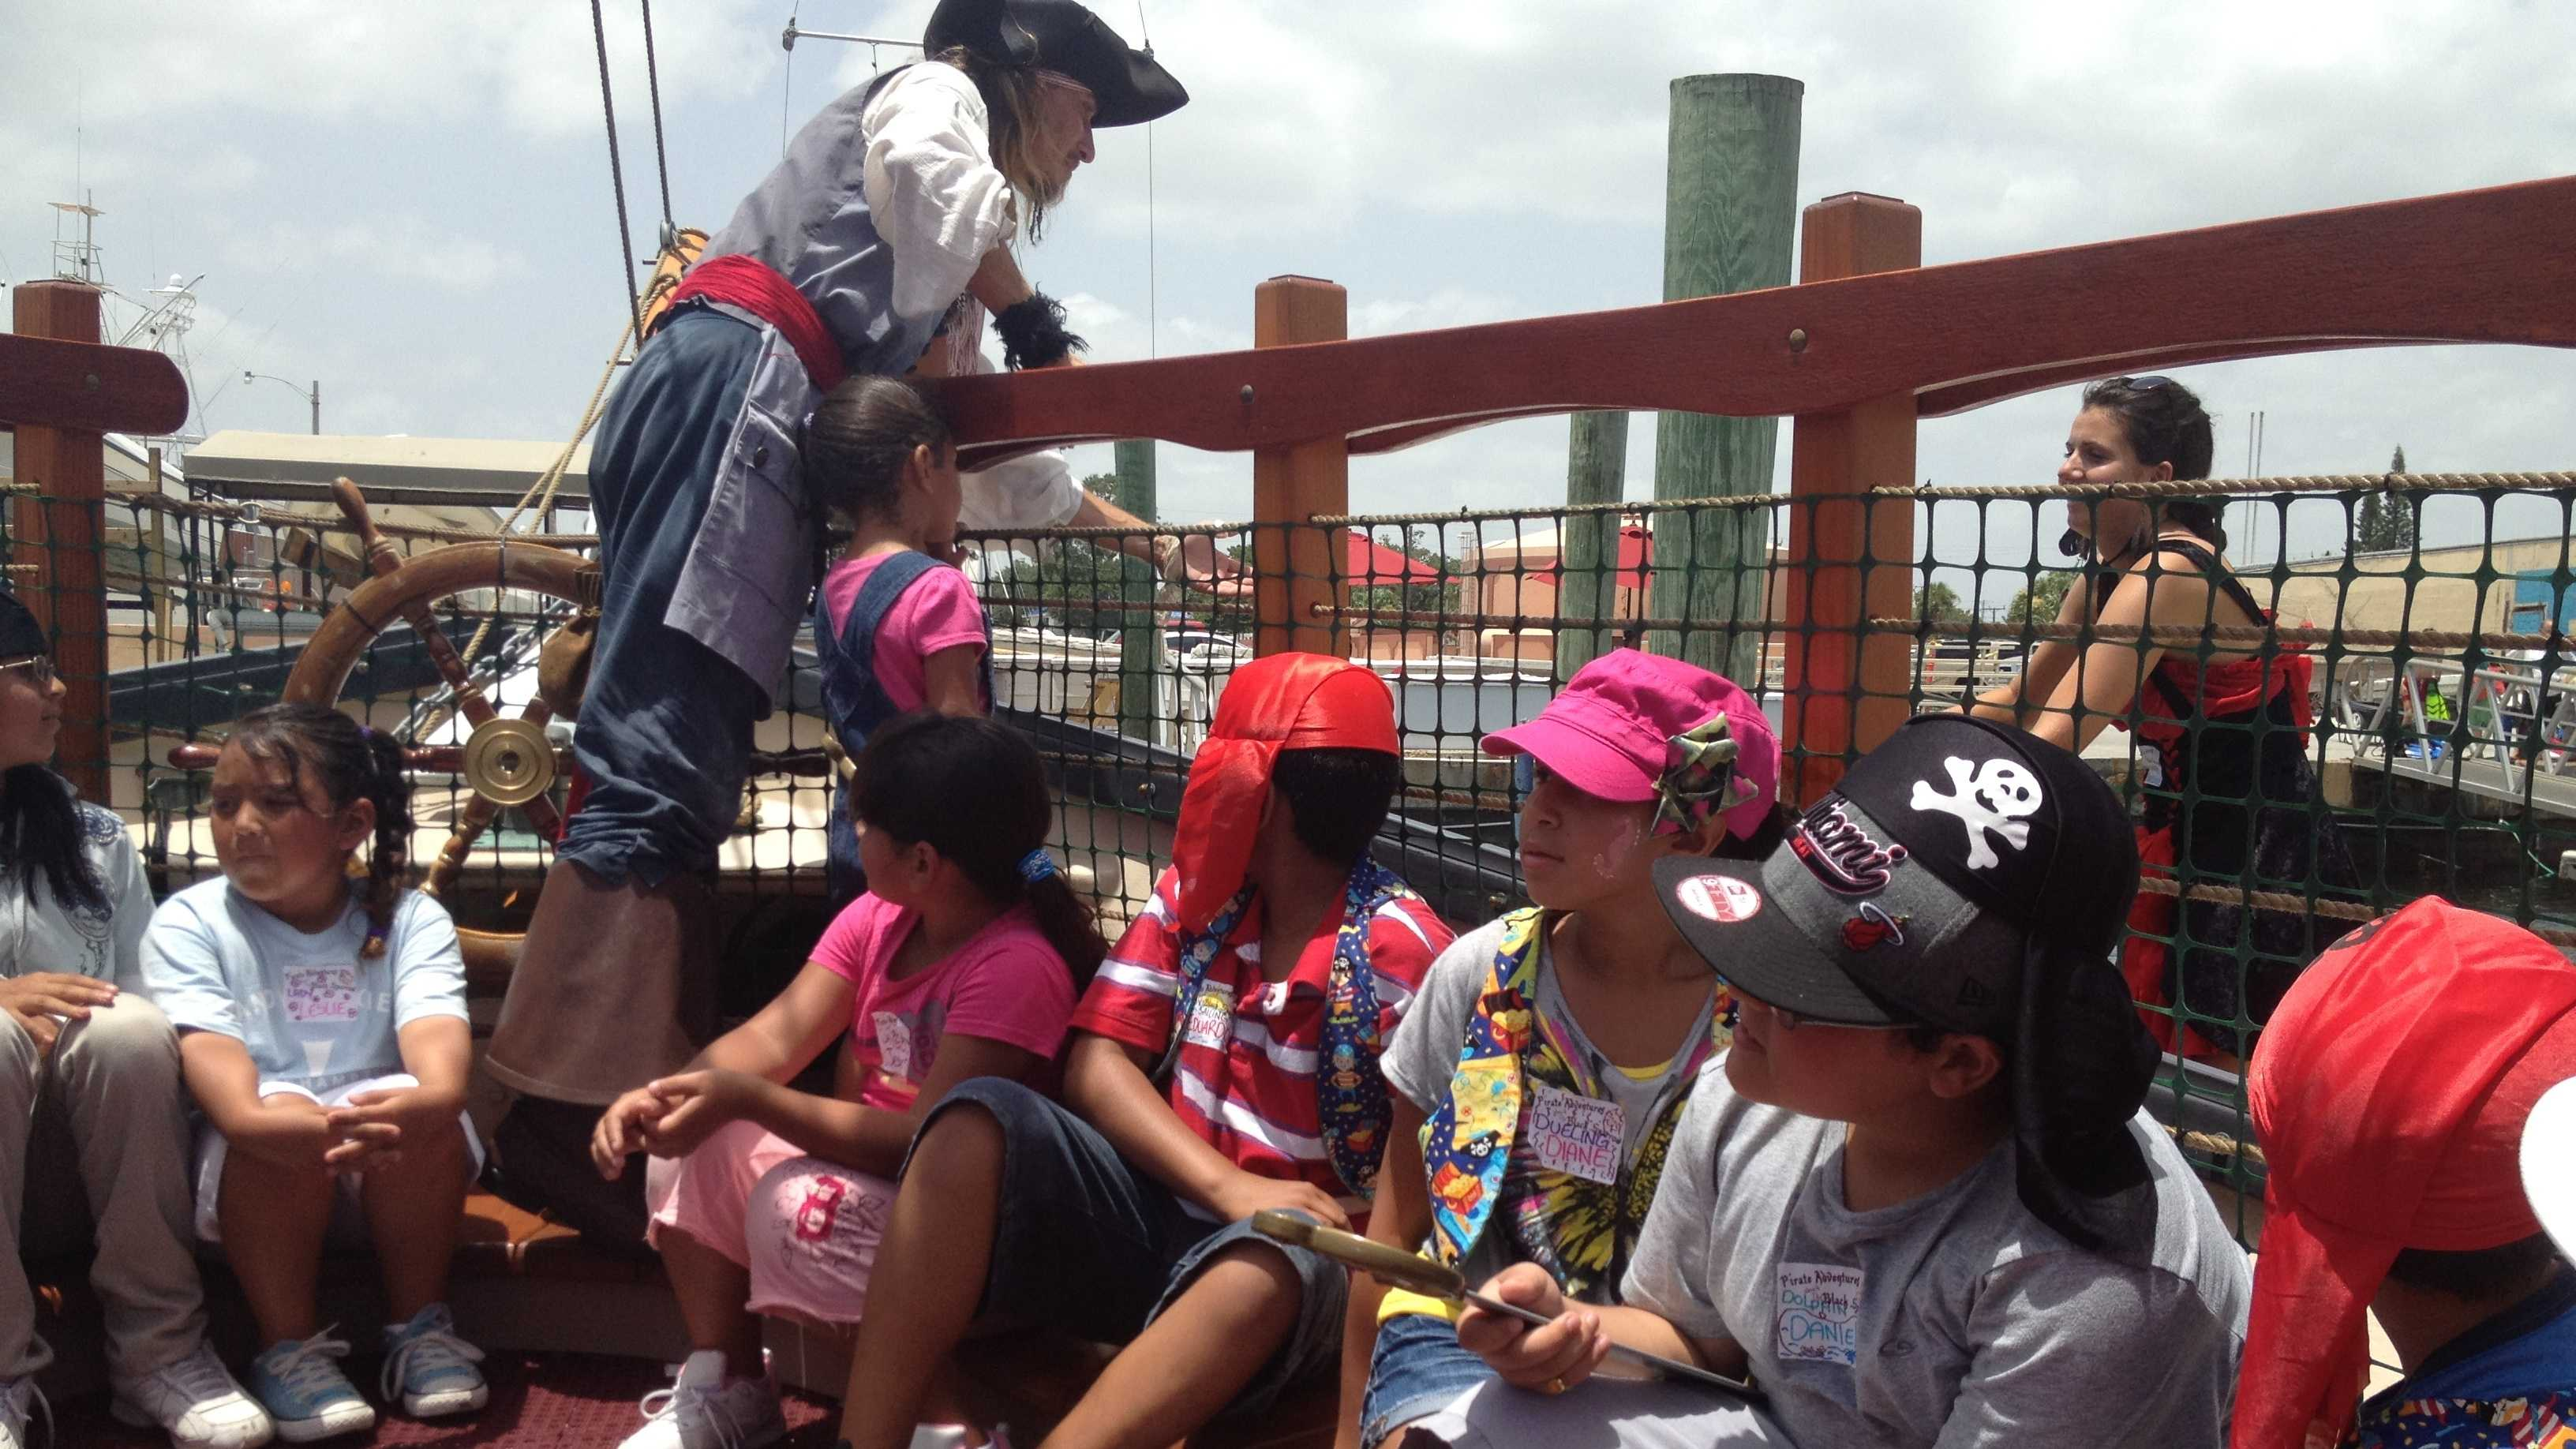 Pediatric cancer patients aboard Black Sparrow